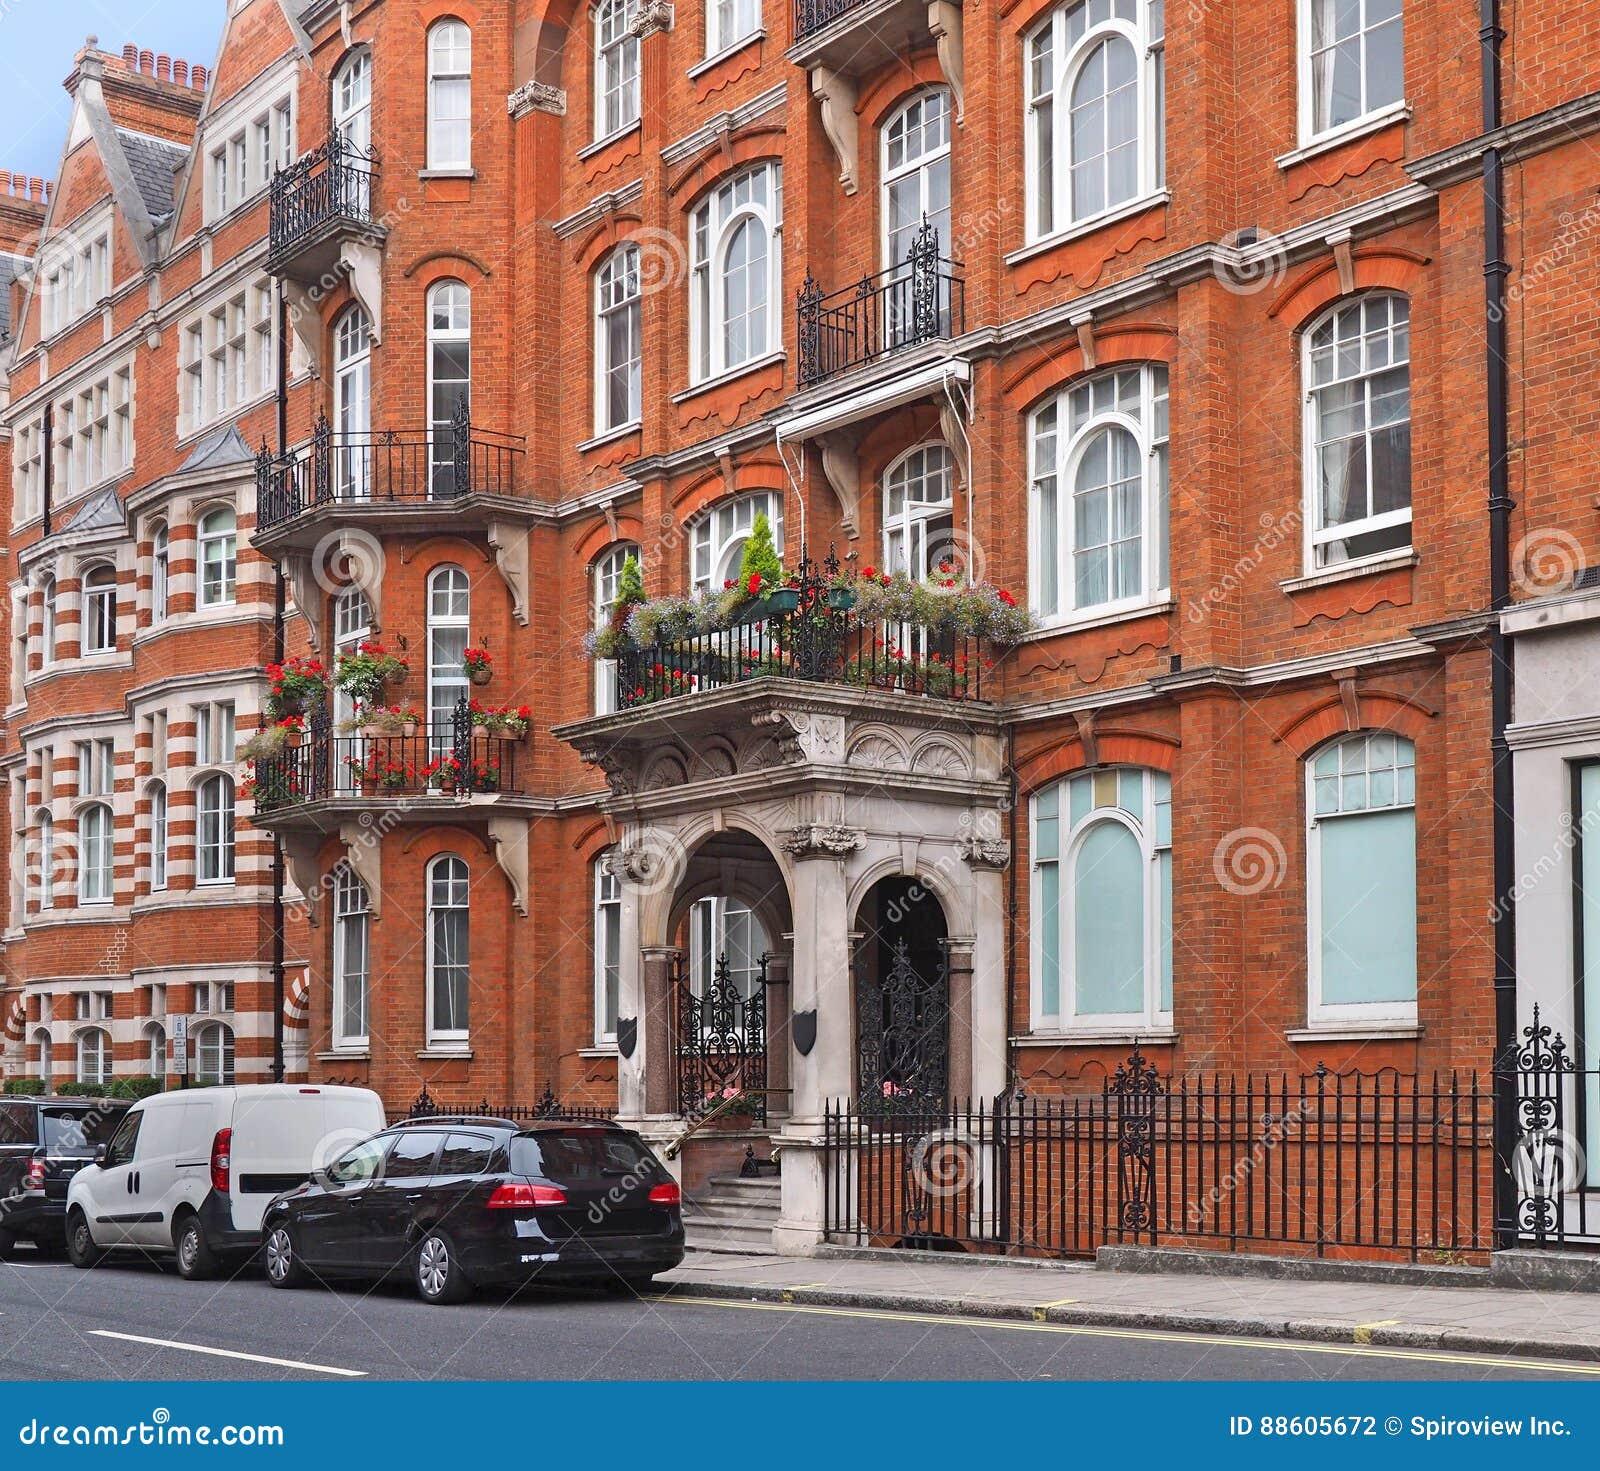 London apartment buildings stock photo. Image of london - 88605672